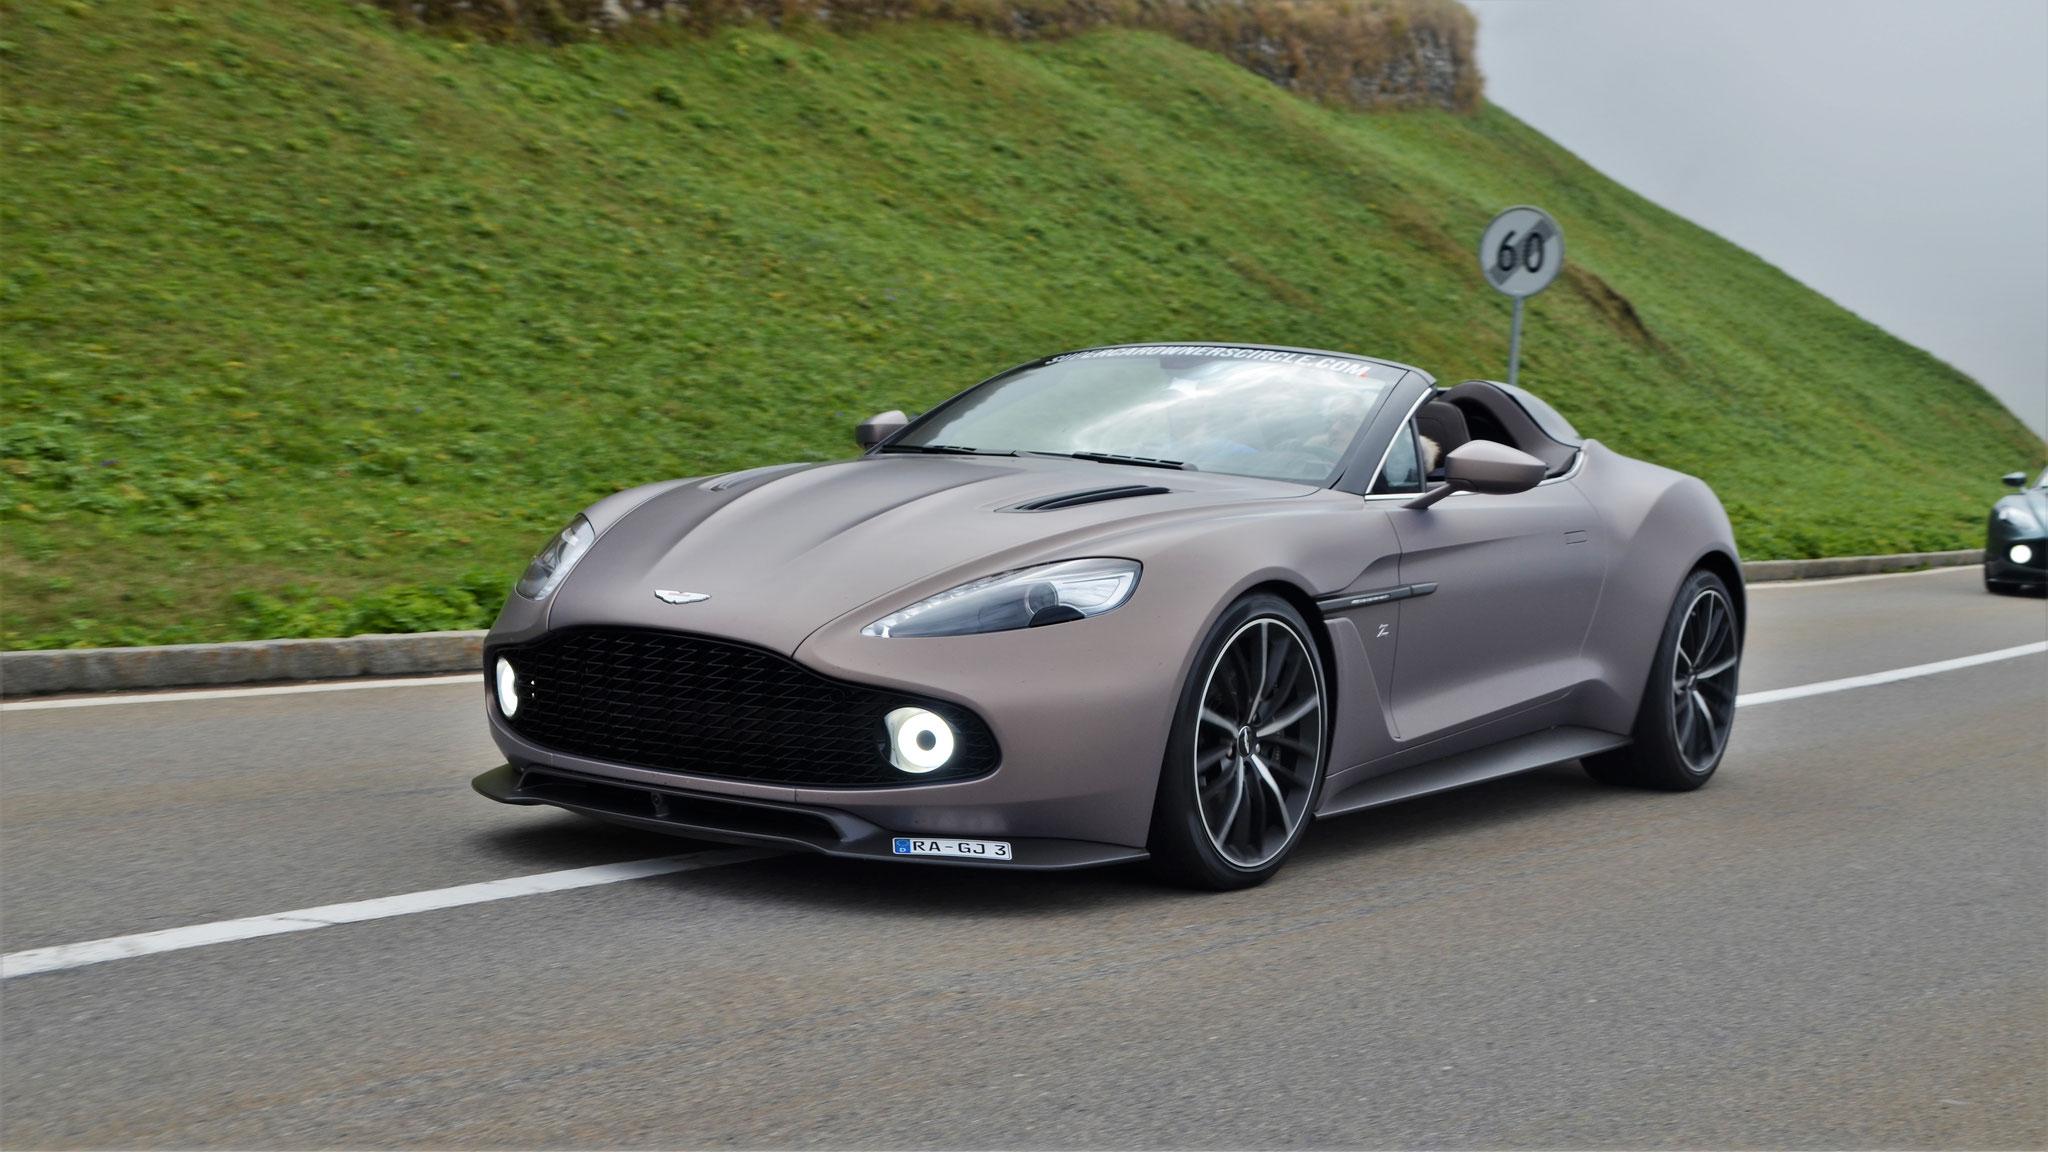 Aston Martin Vanquish Zagato Speedster (1 of 28) - RA-GJ-3